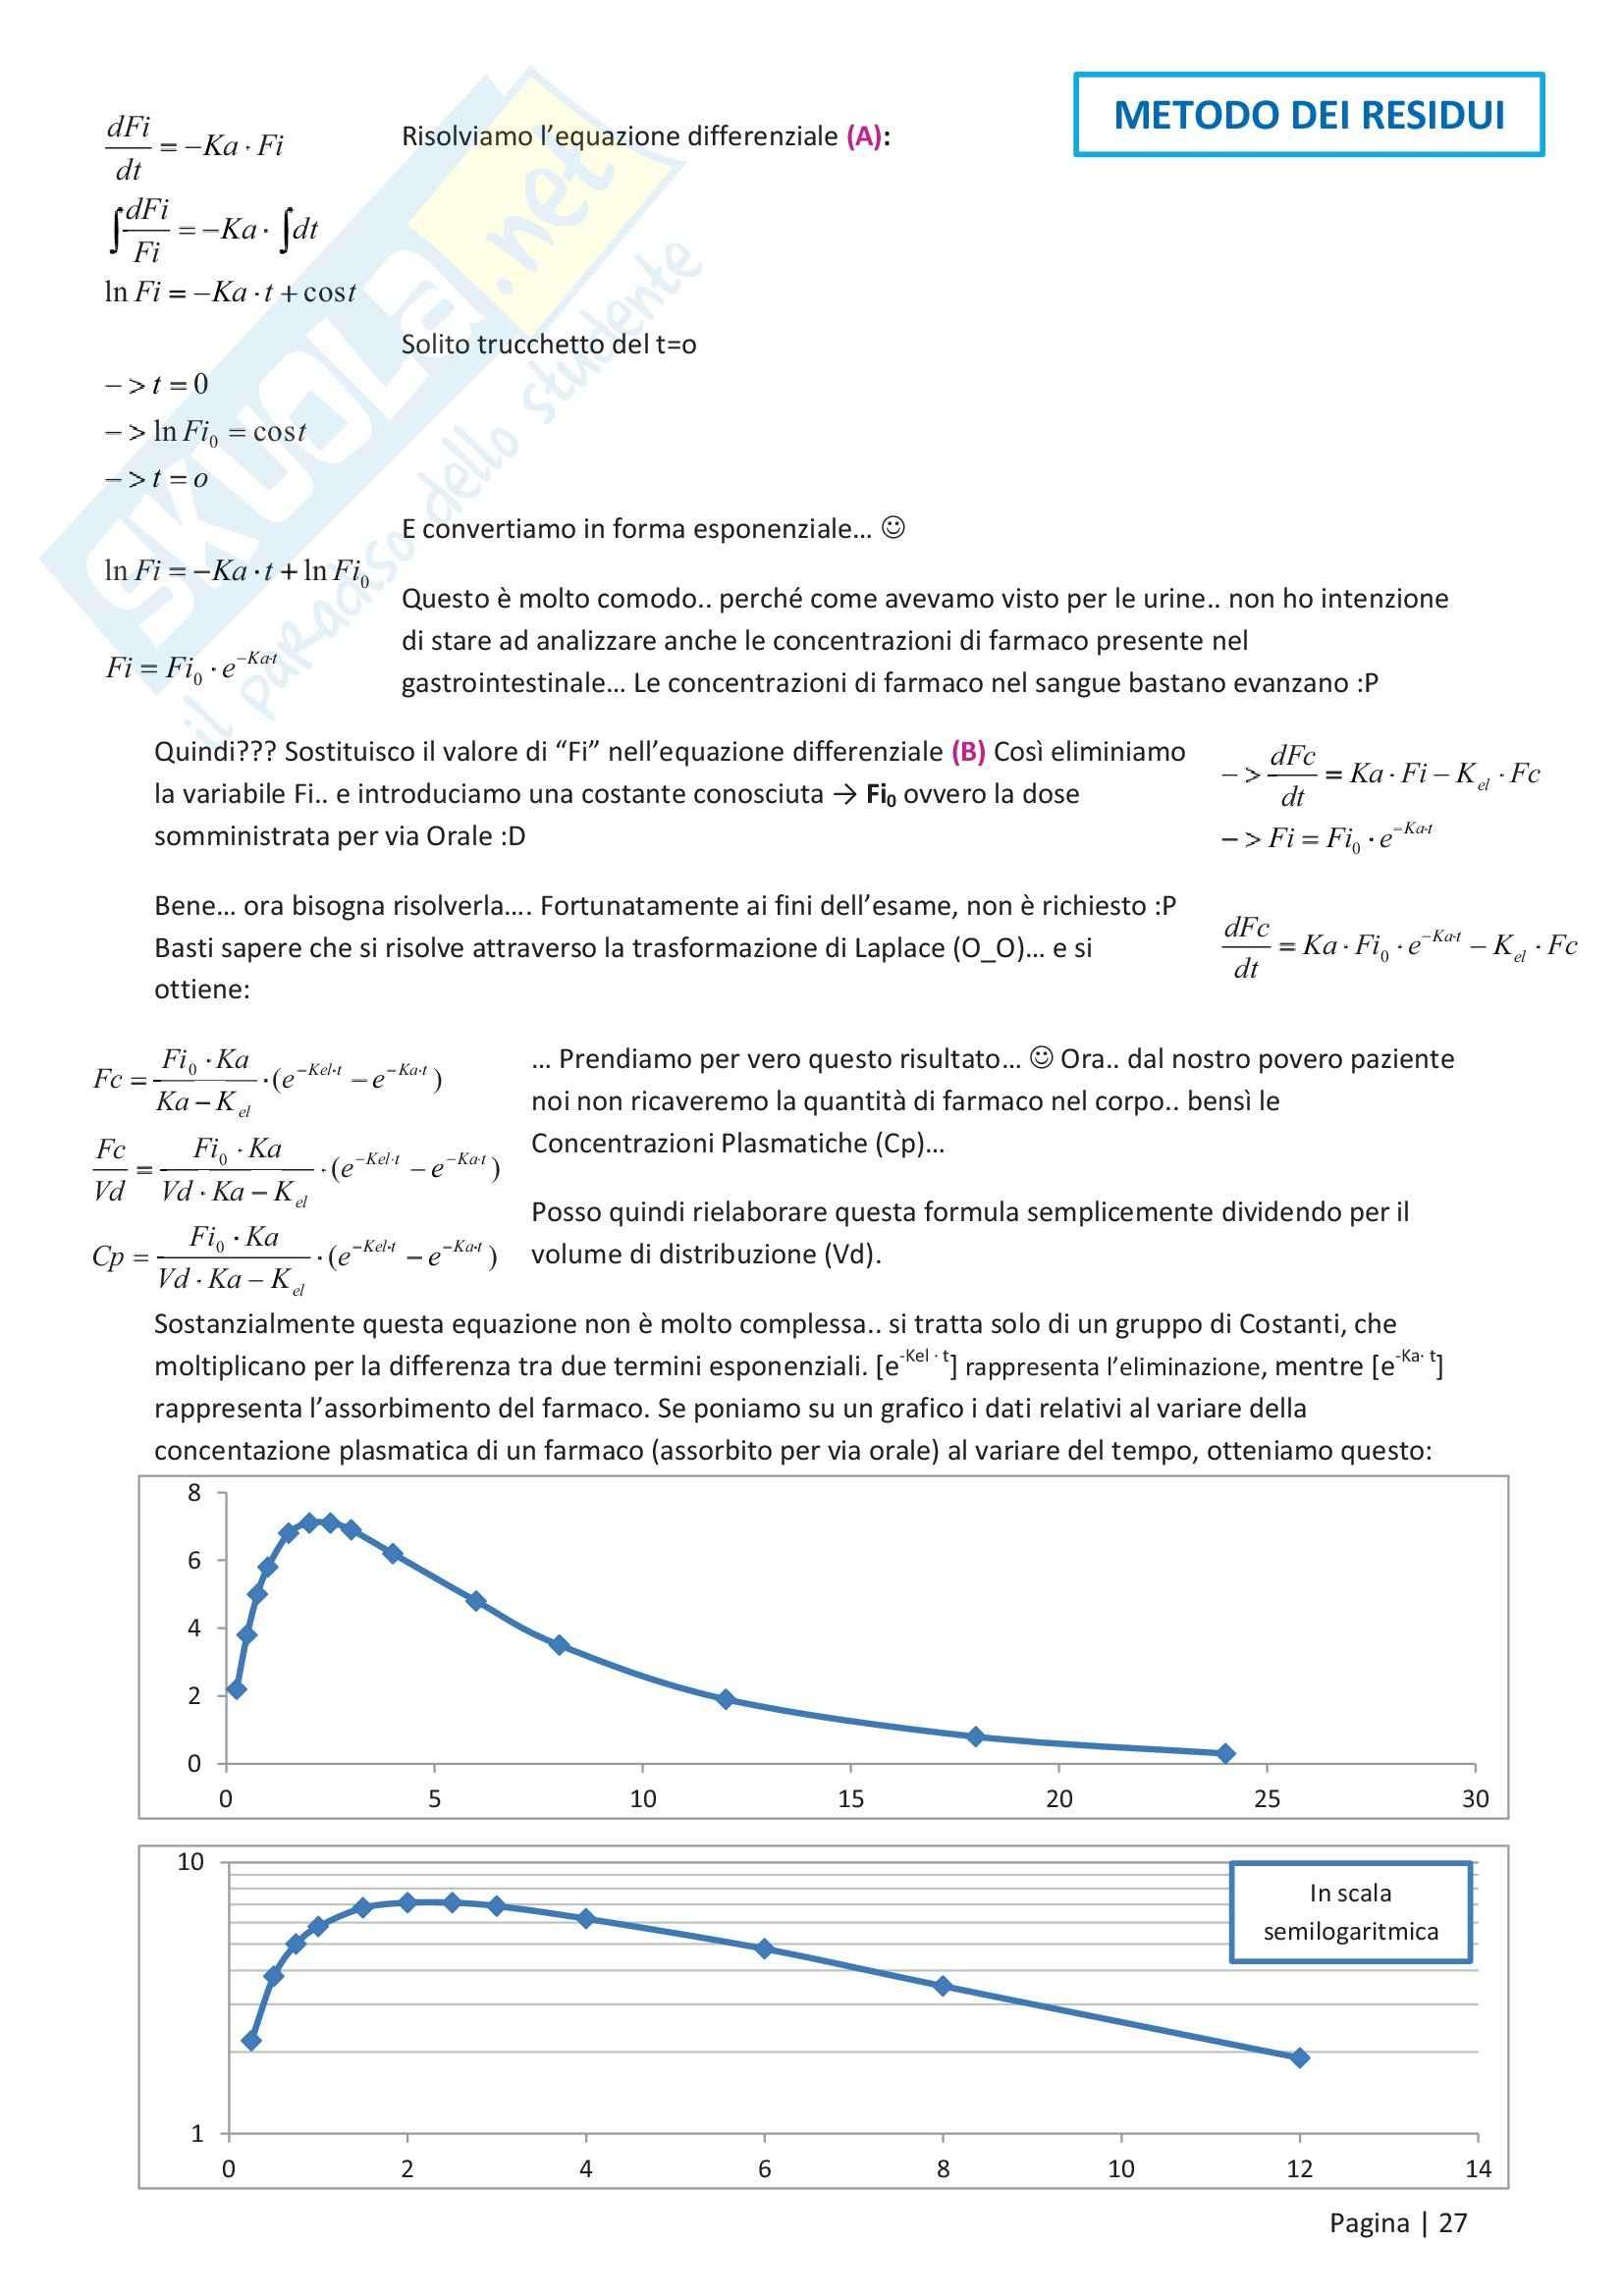 Biofarmaceutica - Appunti Pag. 26